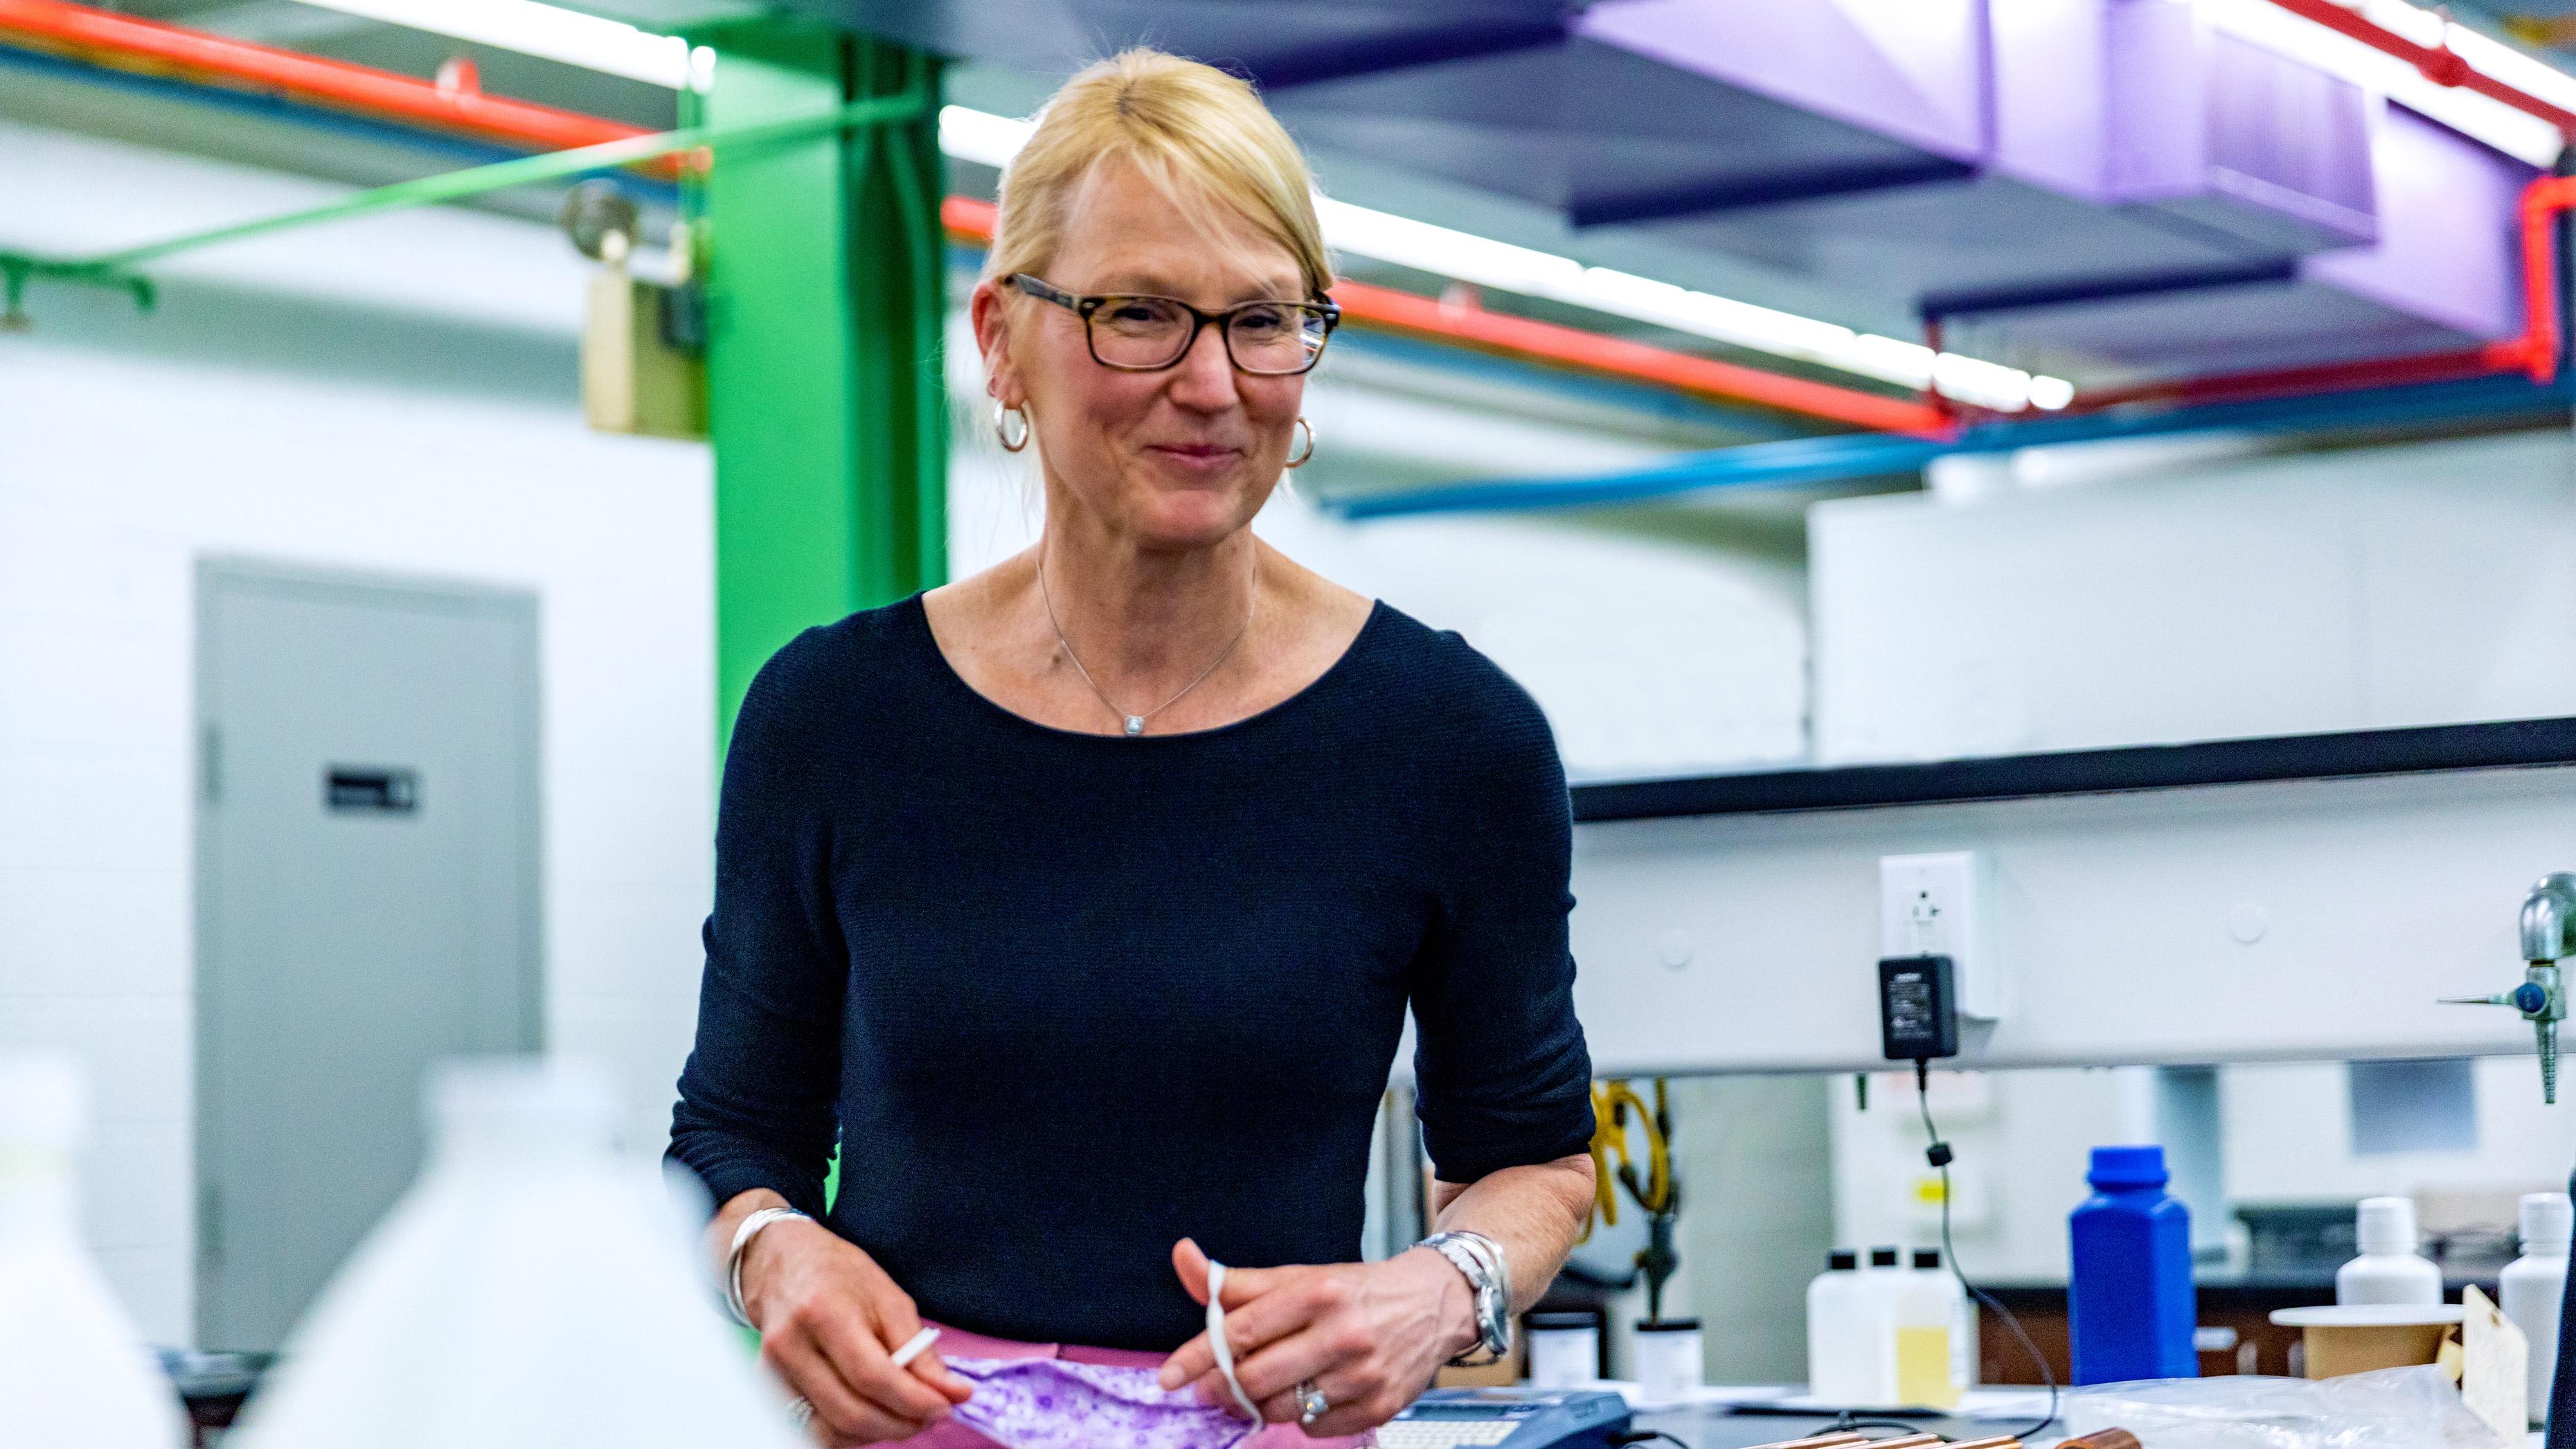 Molly Kellogg of Waterbury CT smiling inside the Hubbard Hall Chemistry Lab